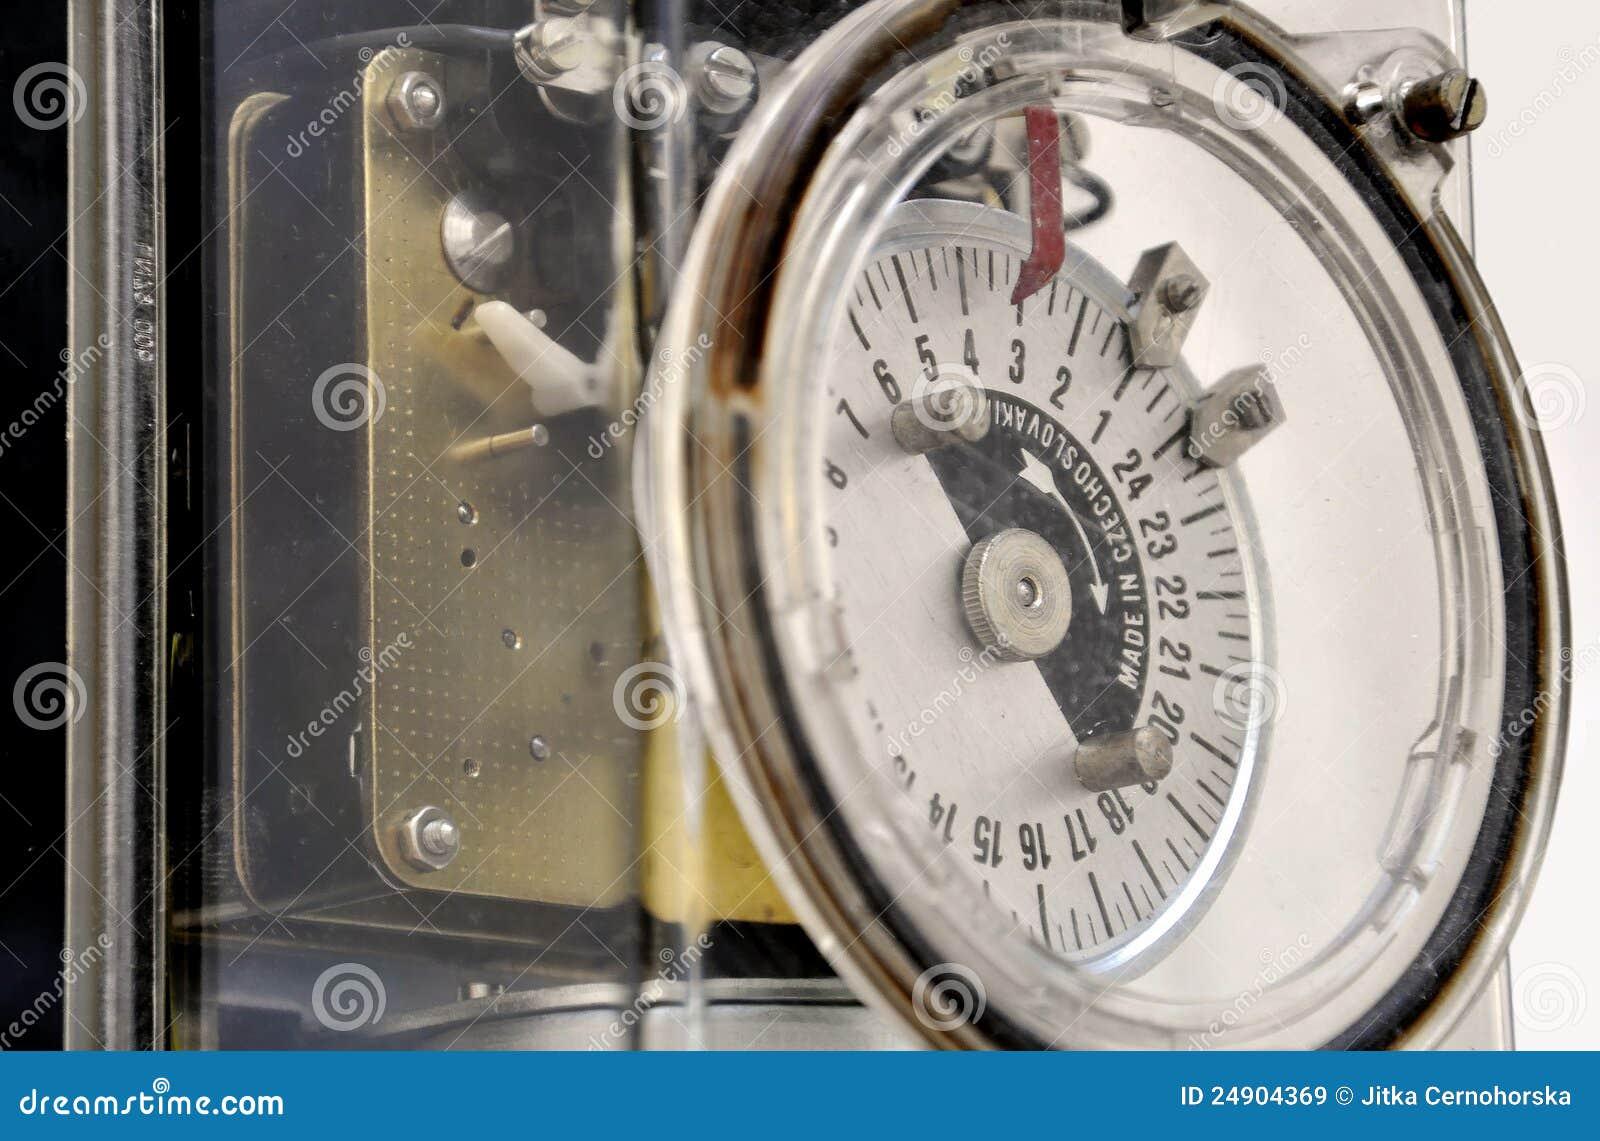 Multiple tariff meter